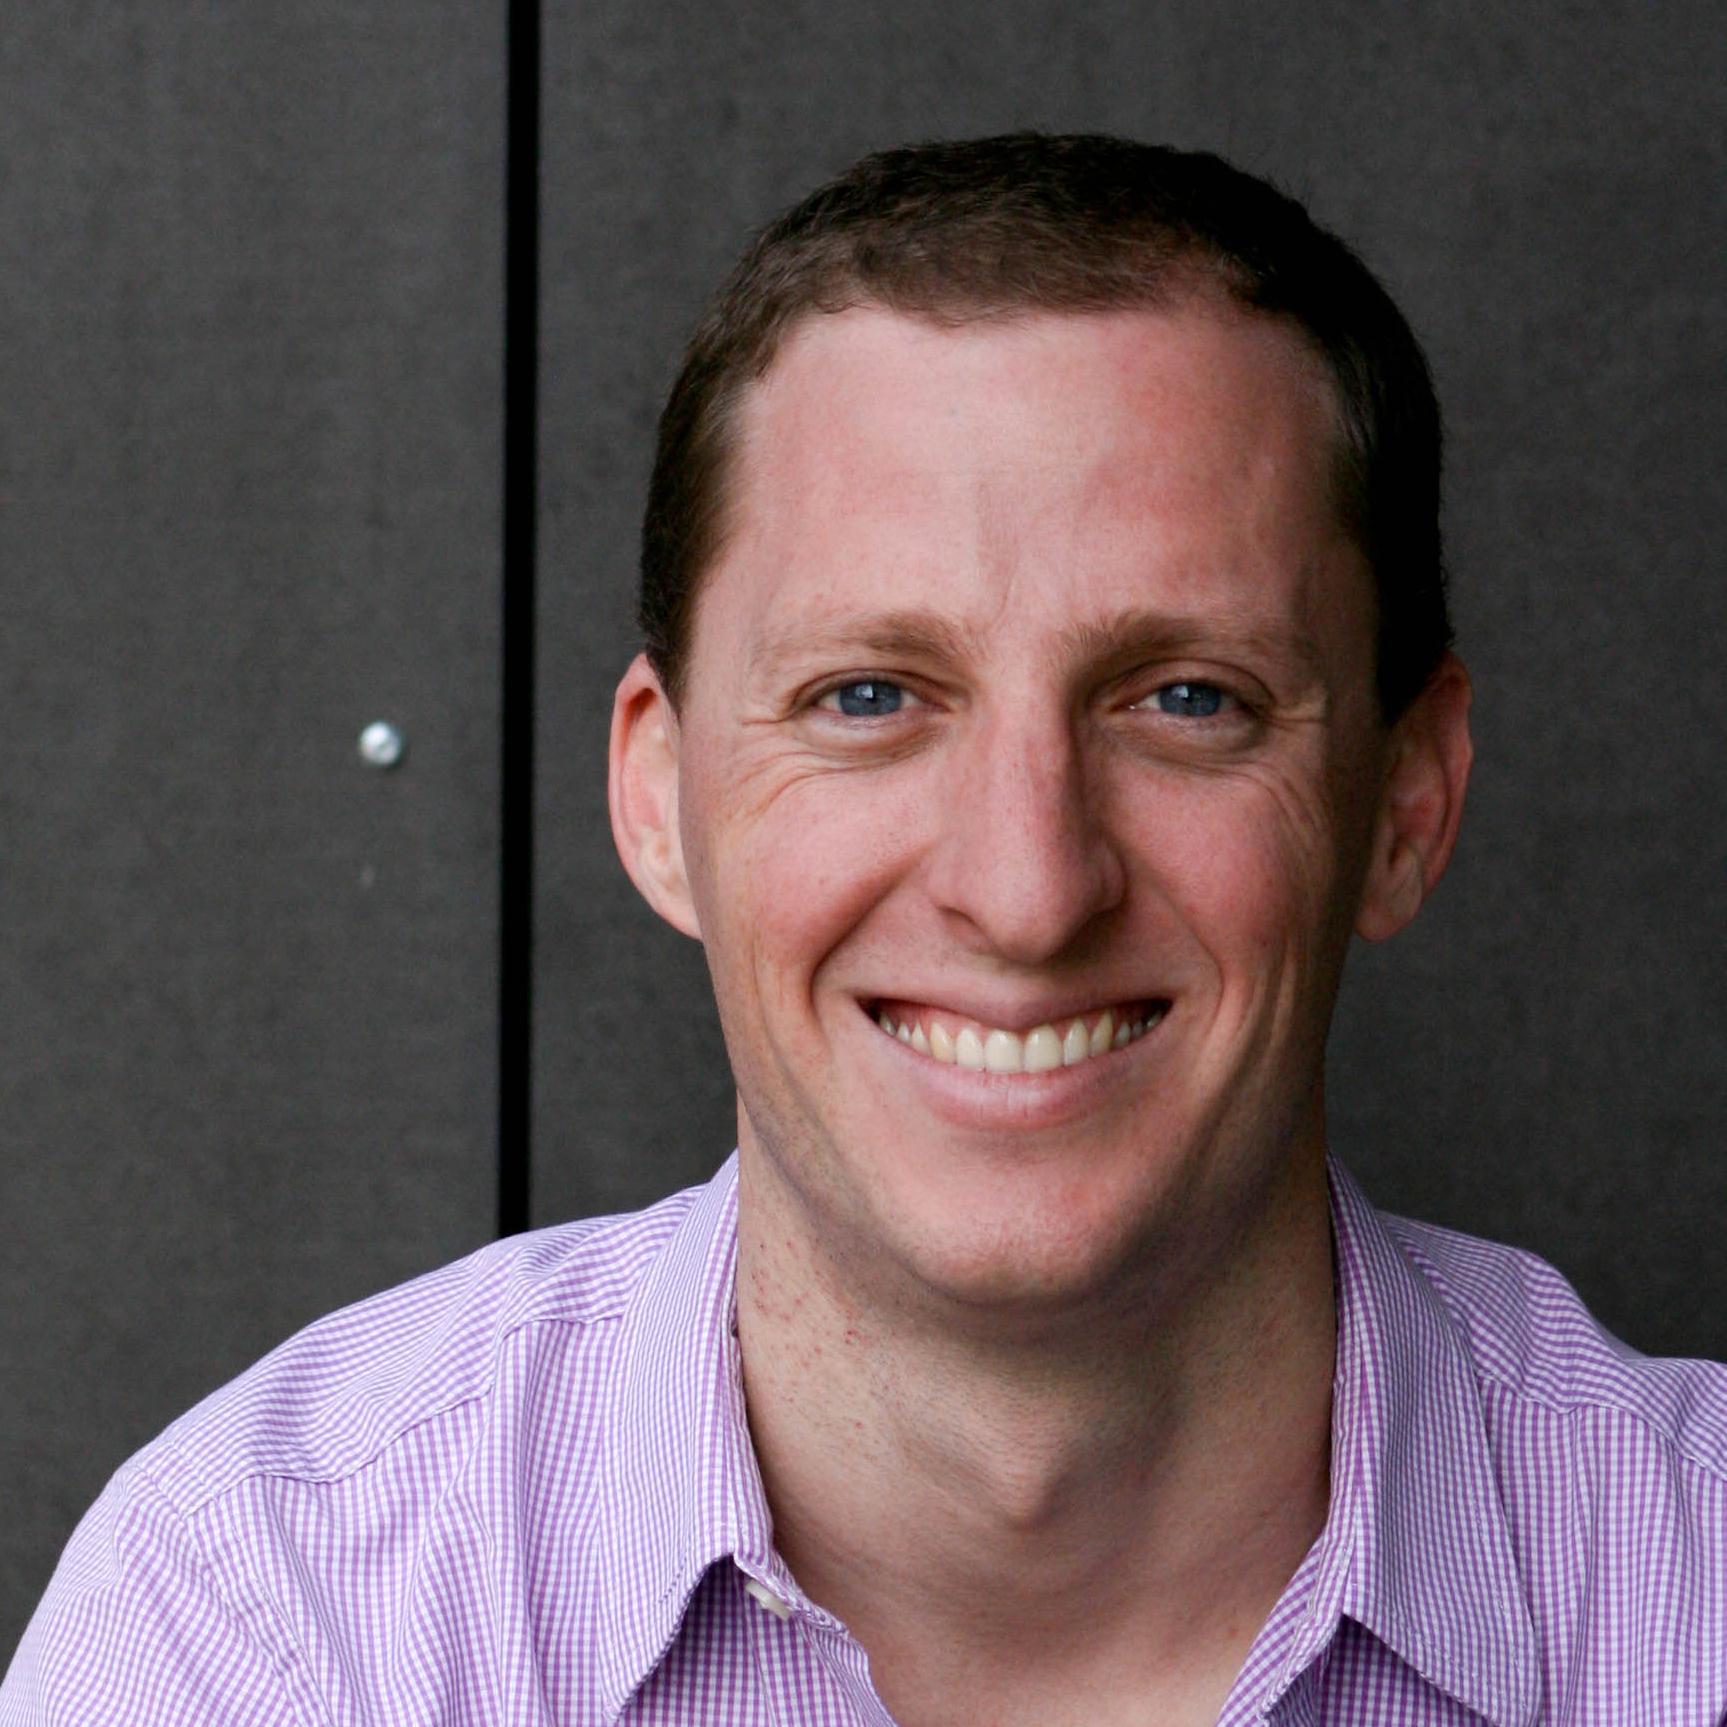 Alexander Hanway, Senior Product Marketing Manager for Encryption, Gemalto